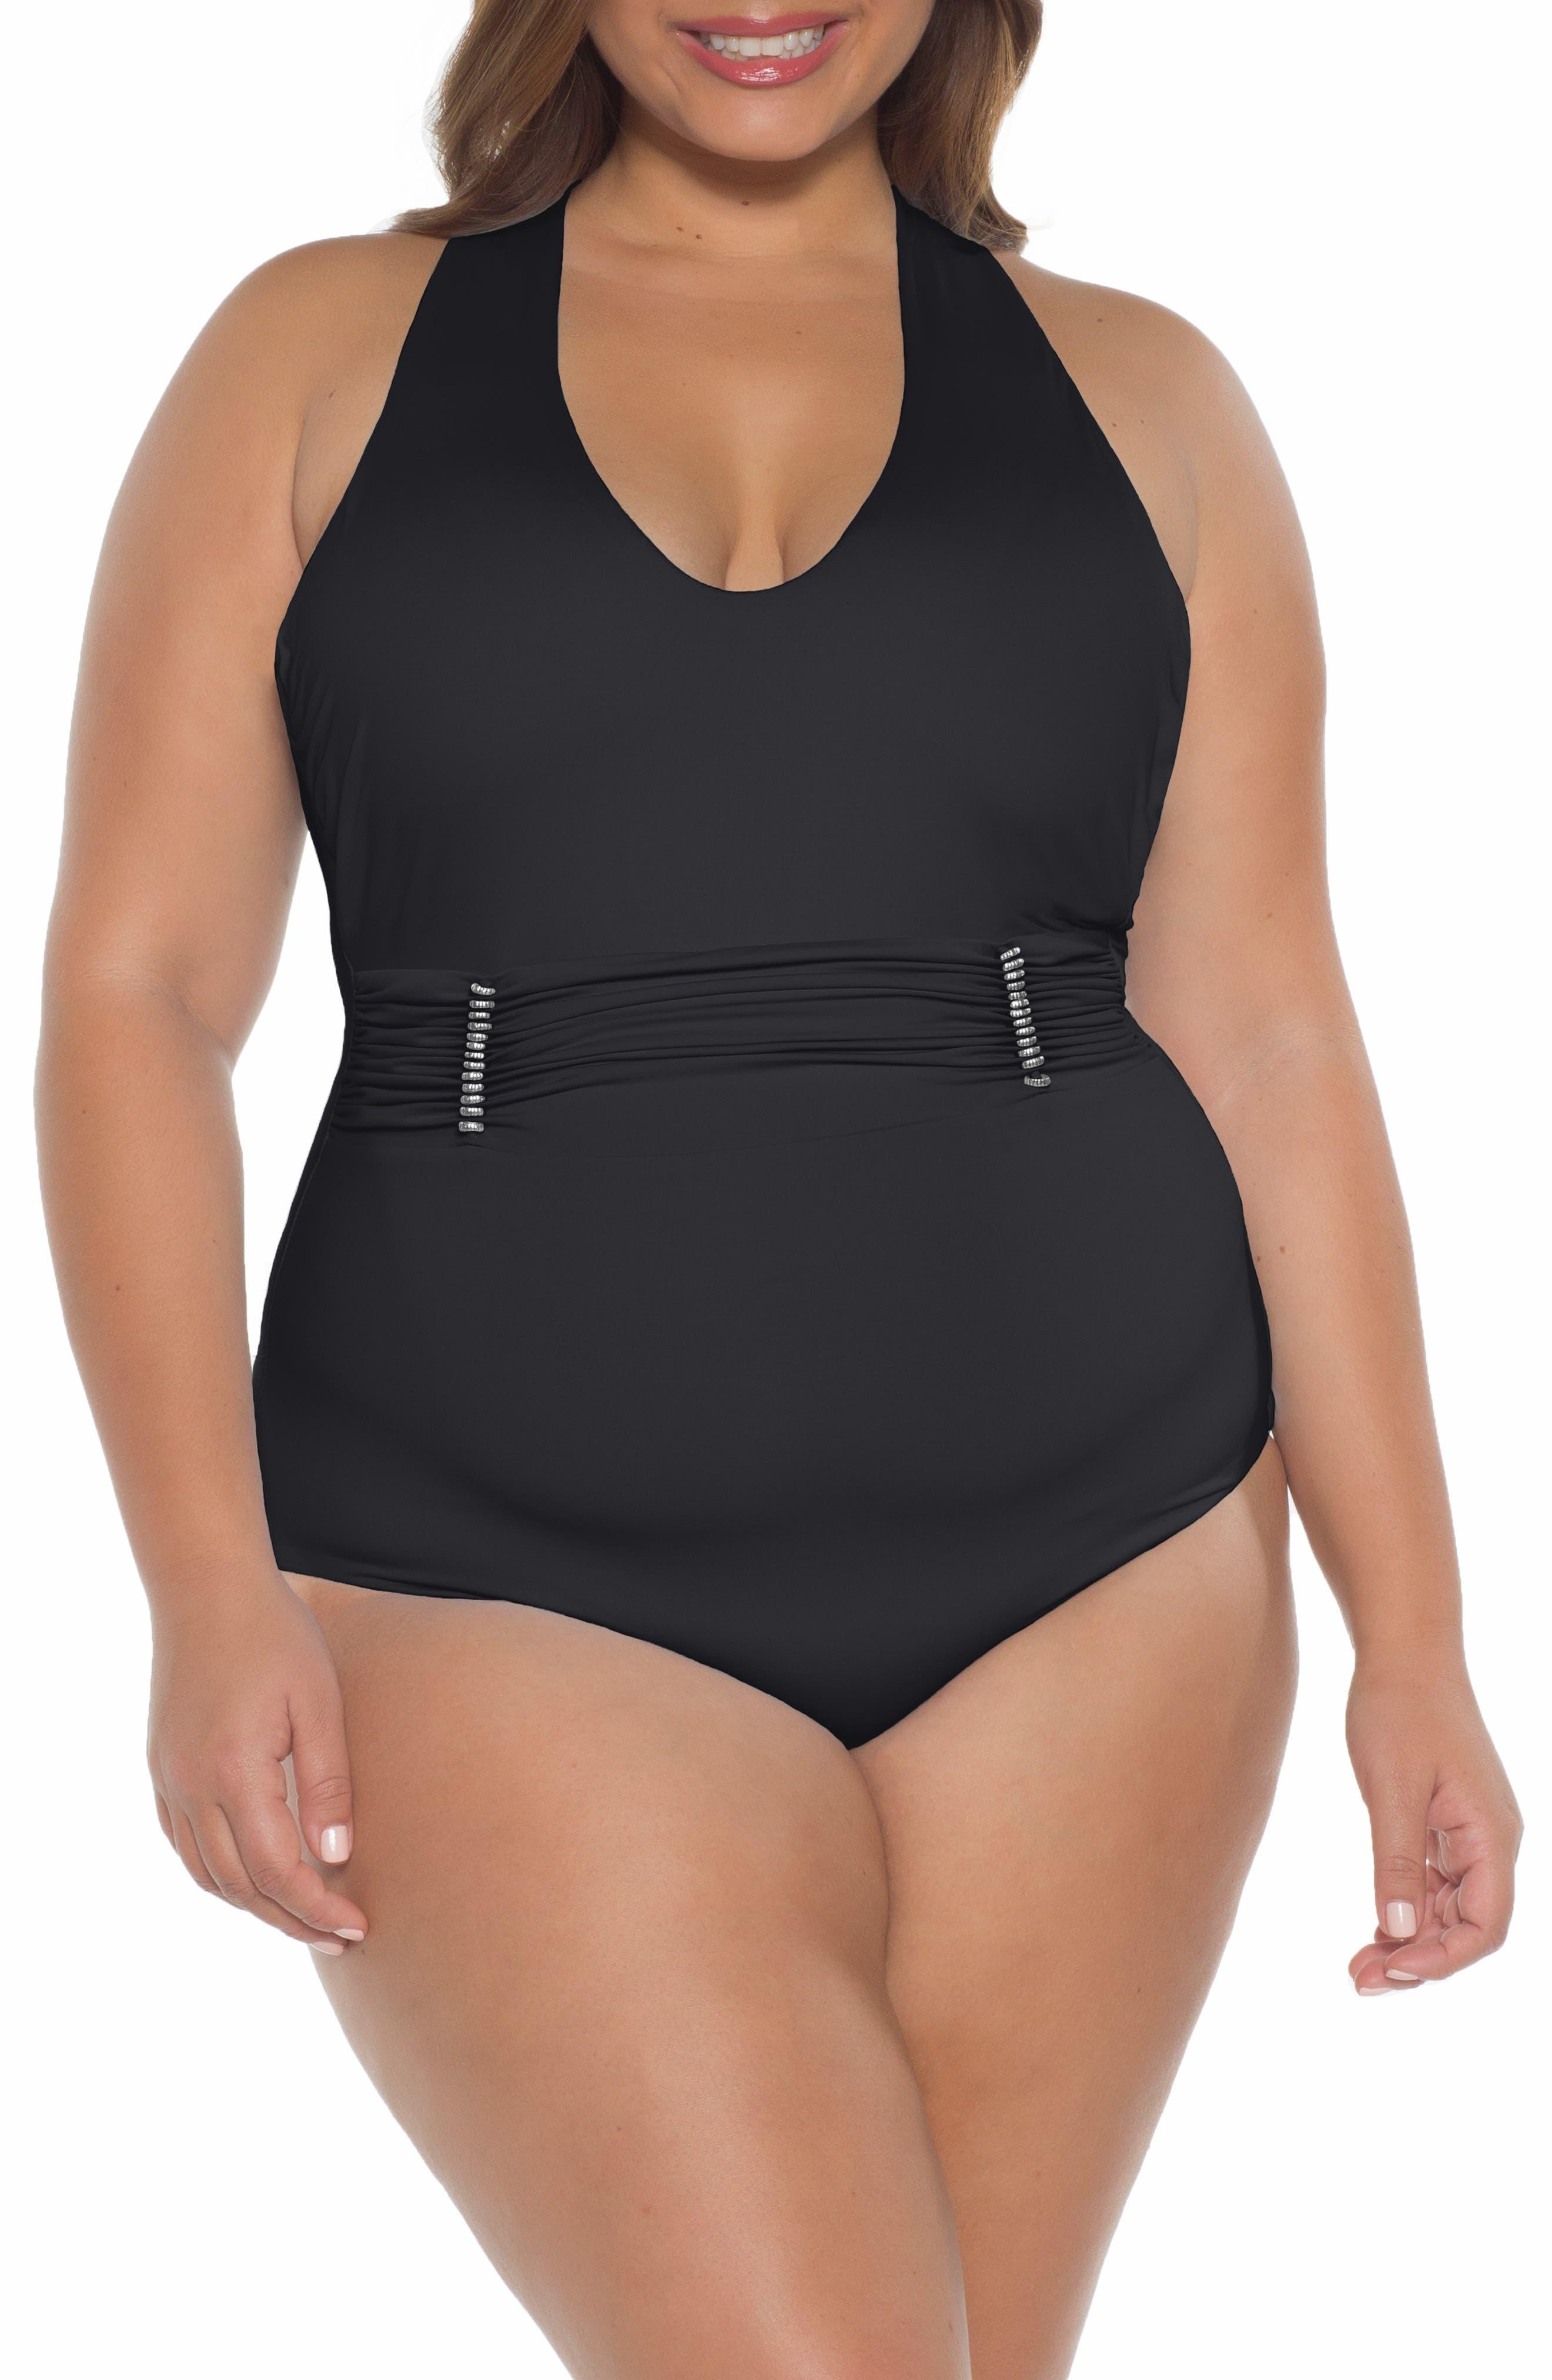 Plus Size Becca Etc. Reconnect One-Piece Swimsuit, Black